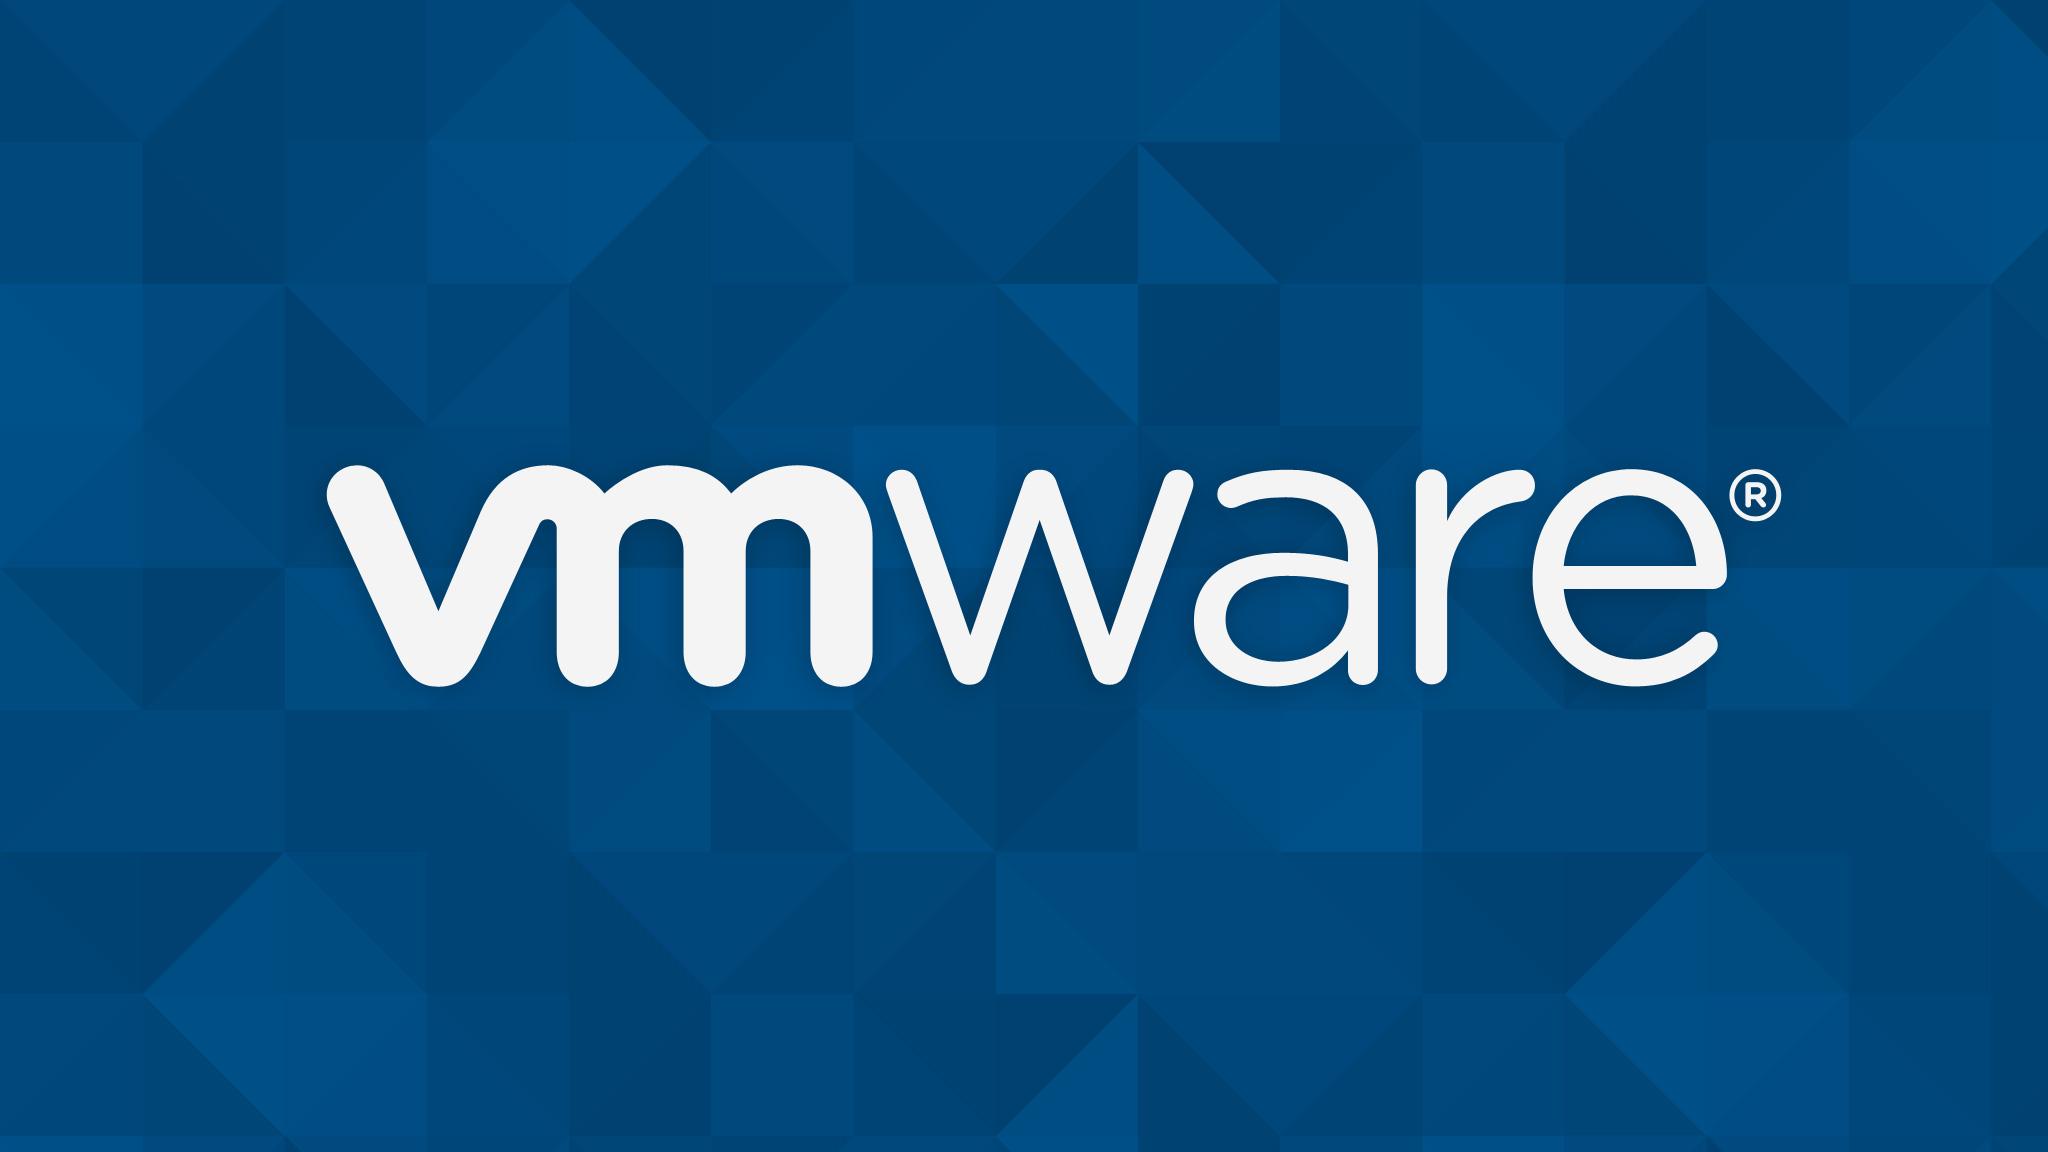 VMware, My VMware Customer Self-Service Portal